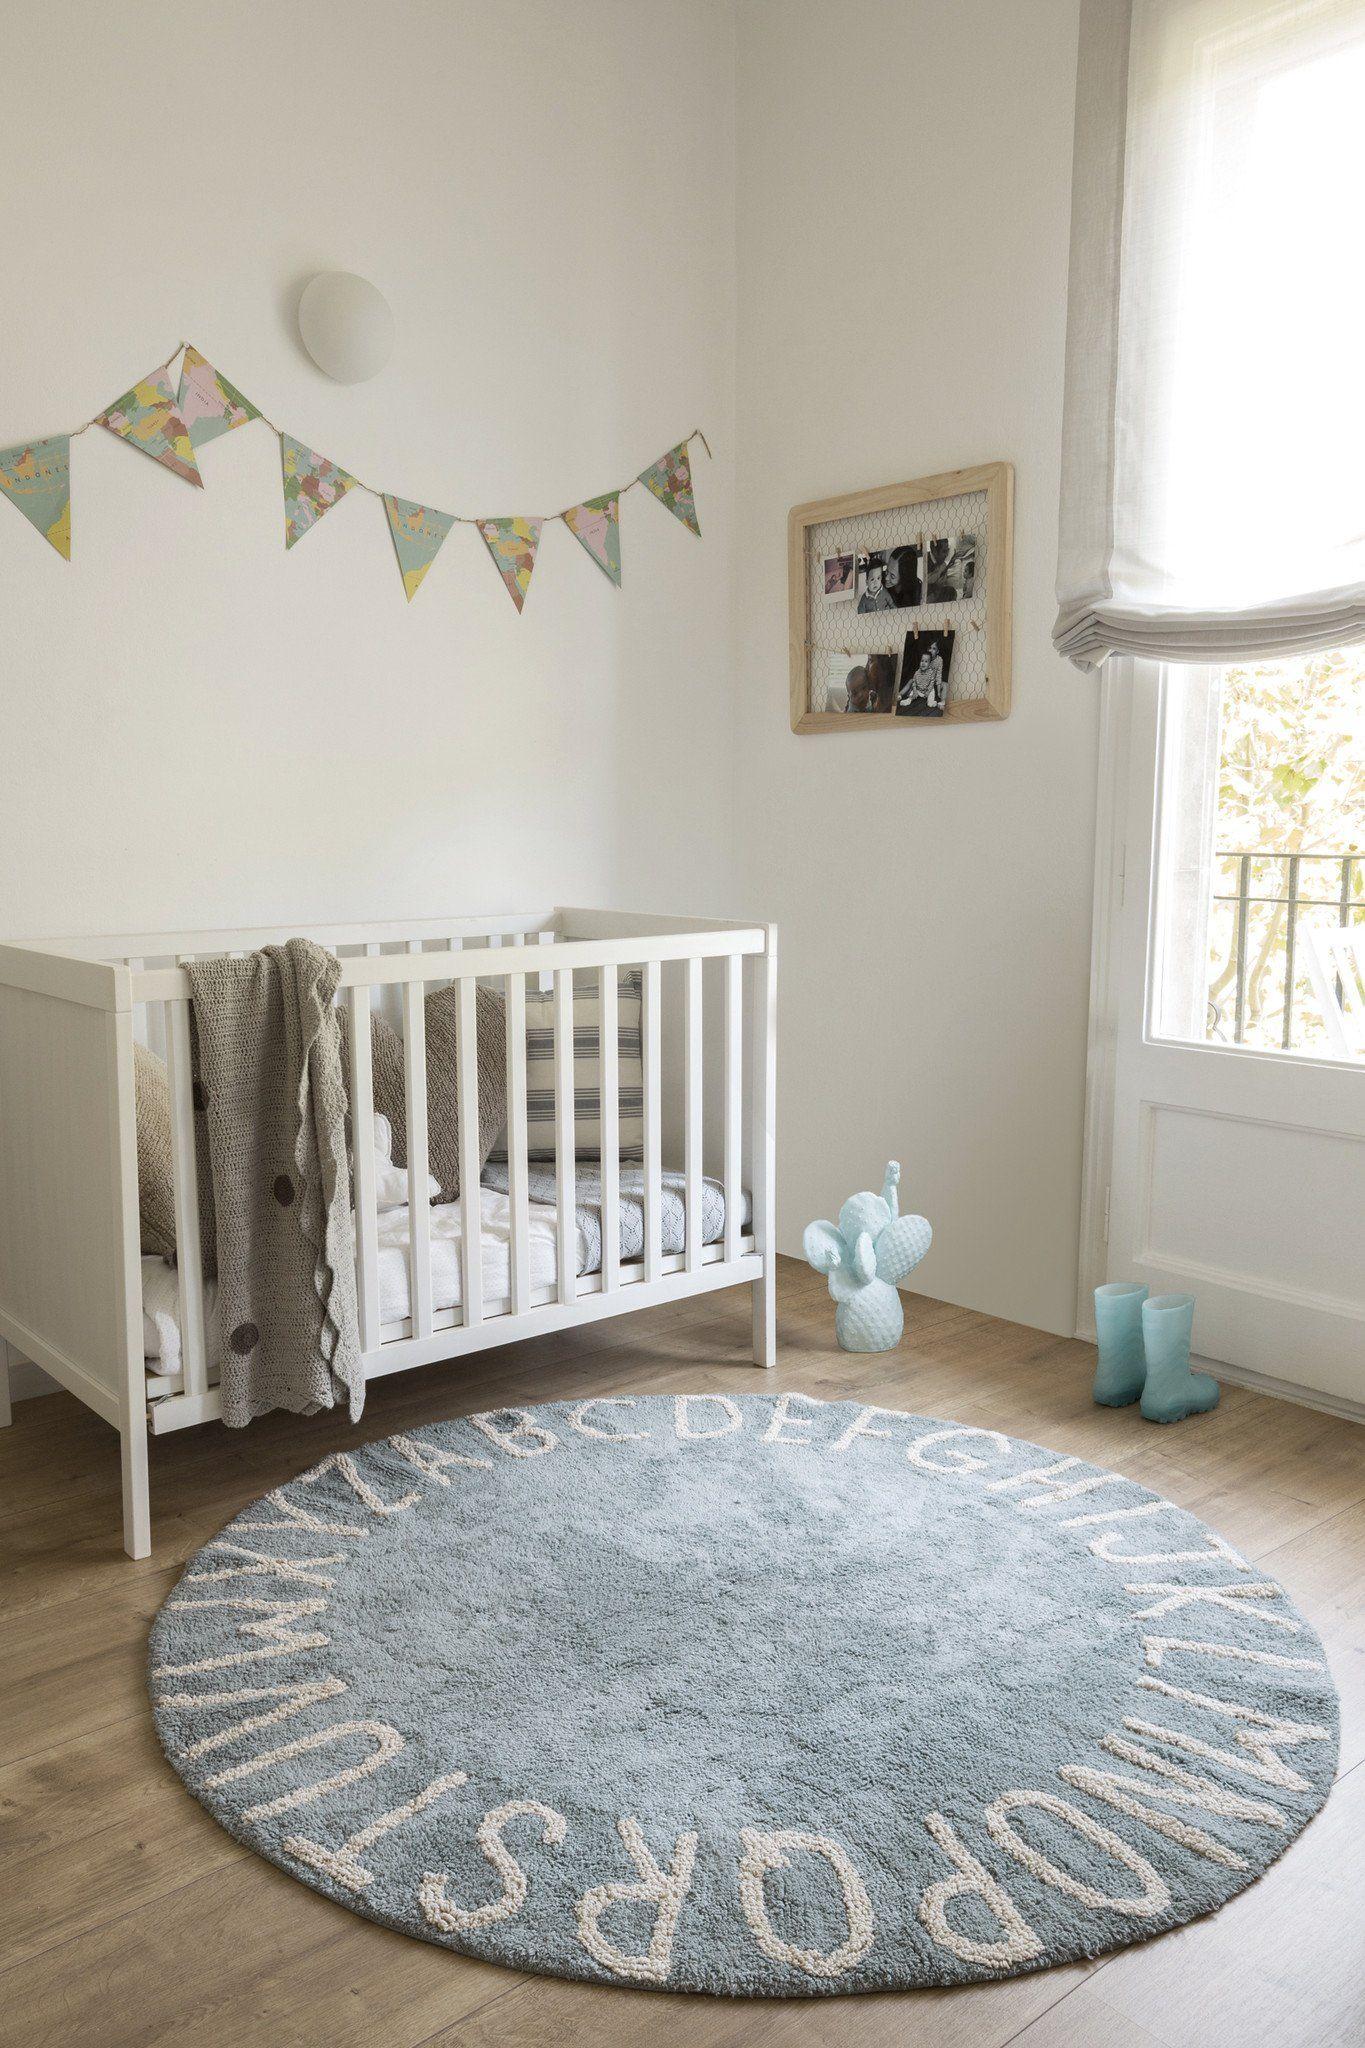 Round Abc Rug Nursery Room Boy